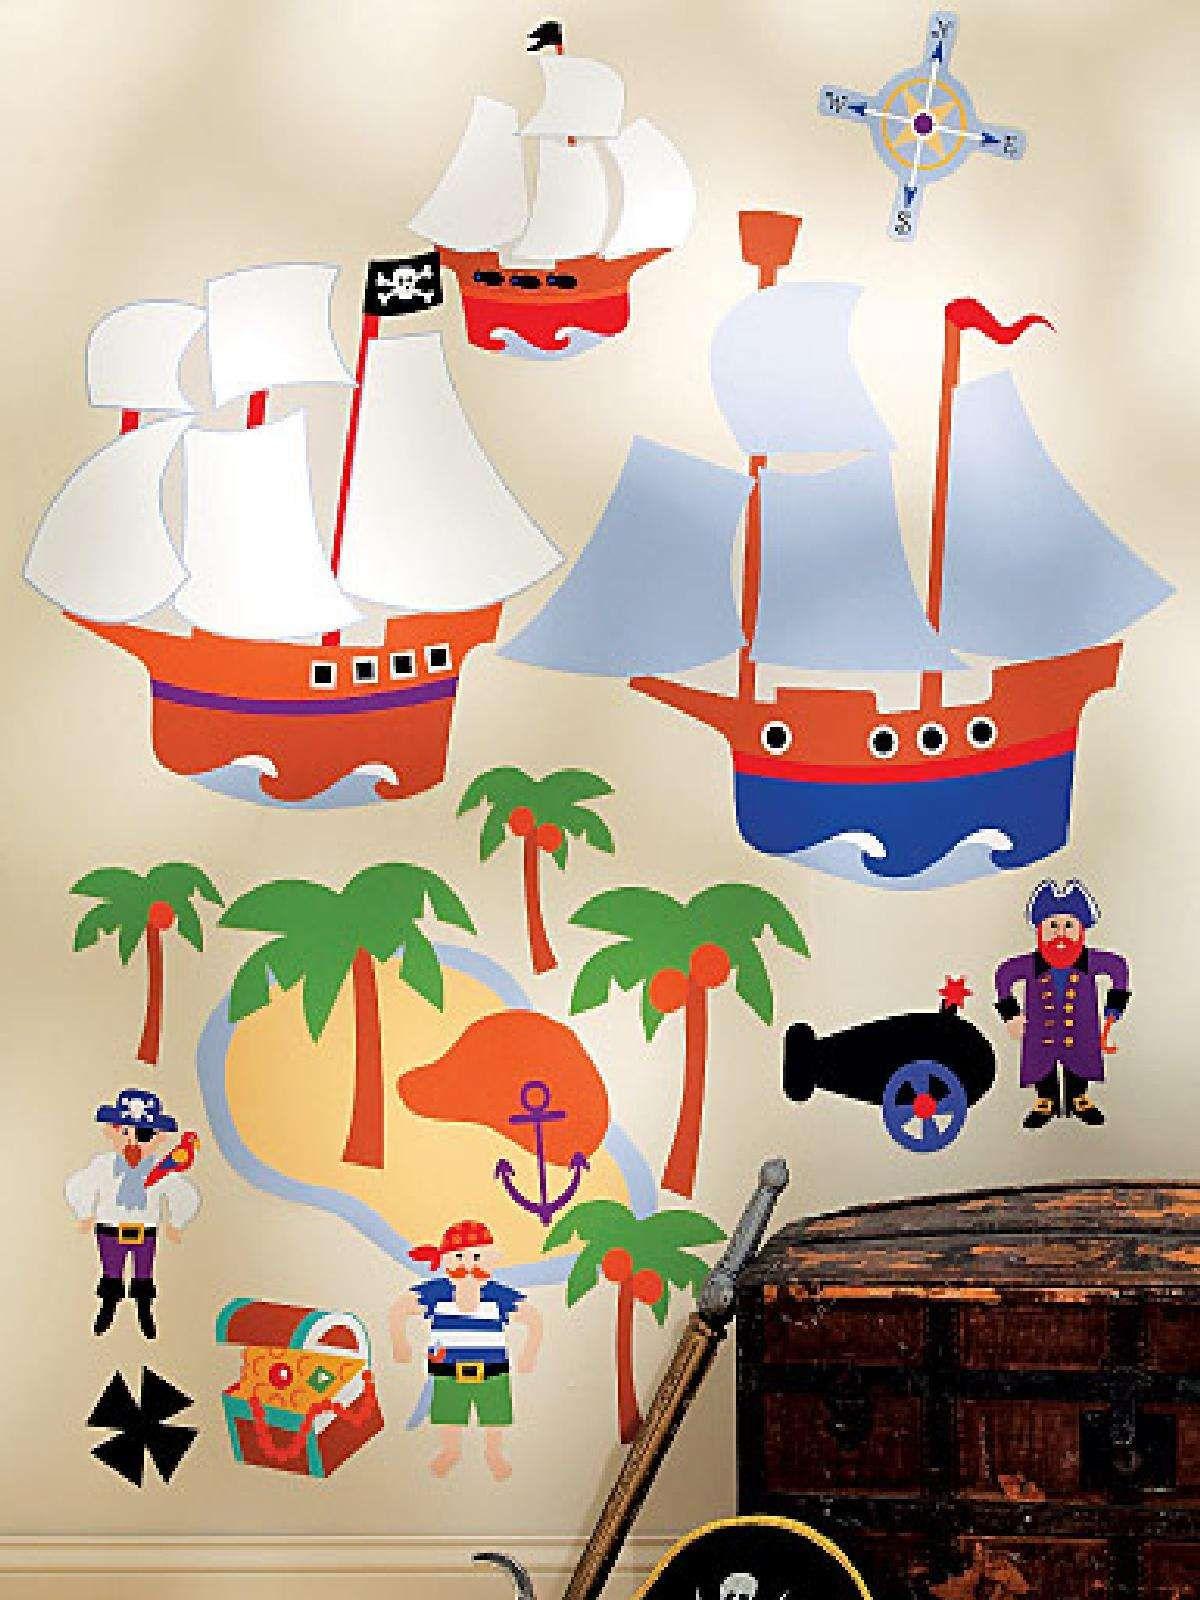 pirate island big wall mural boys bedroom ideas pinterest pirate island big wall mural